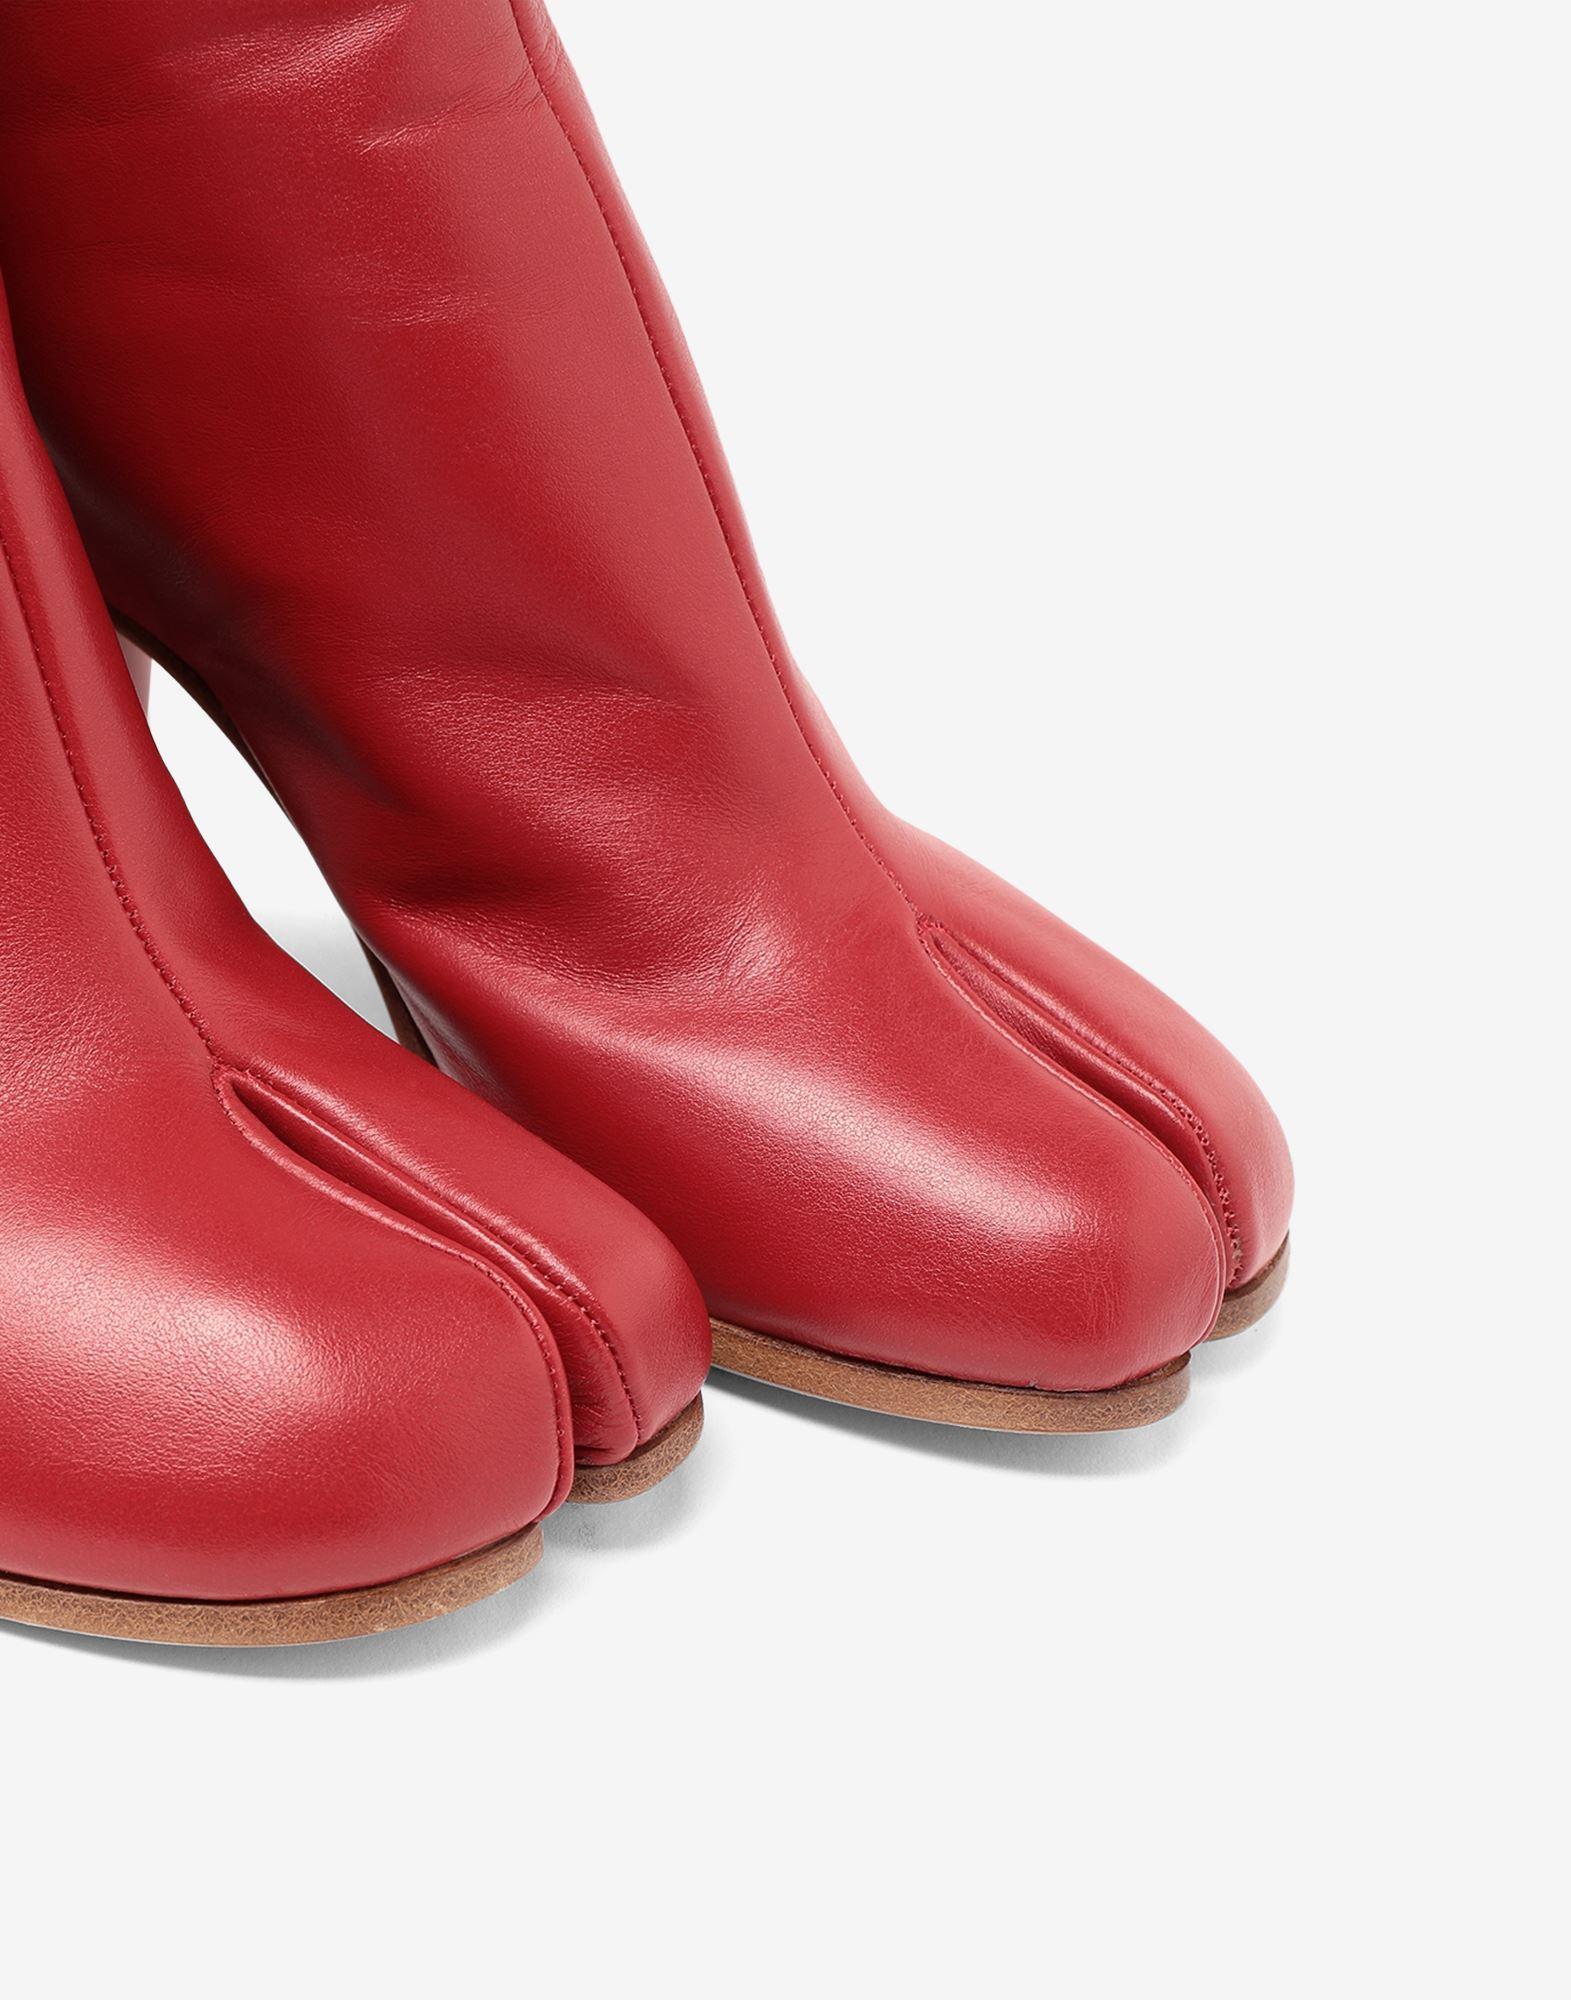 MAISON MARGIELA Tabi calfskin boots Tabi boots & Ankle boots Woman e